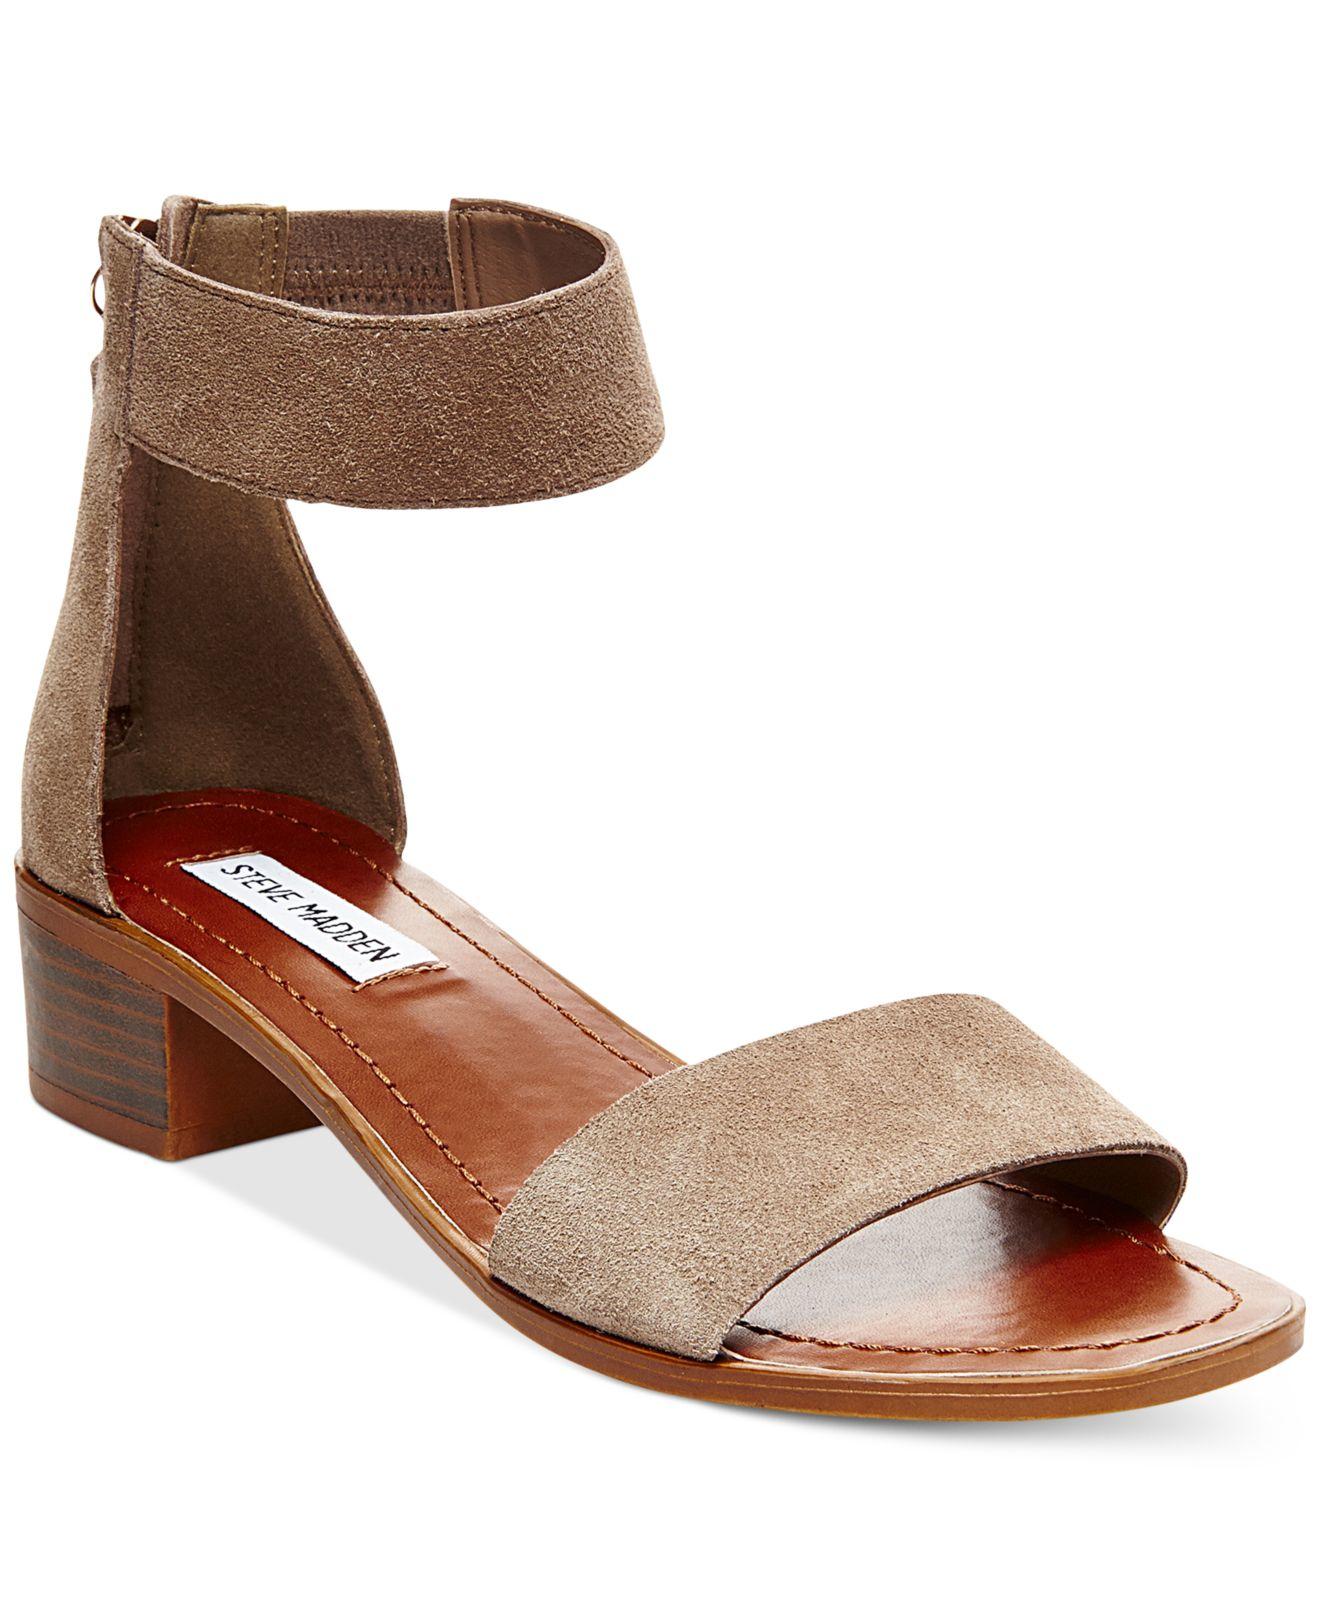 steve madden women 39 s darcie sandals in multicolor taupe suede lyst. Black Bedroom Furniture Sets. Home Design Ideas